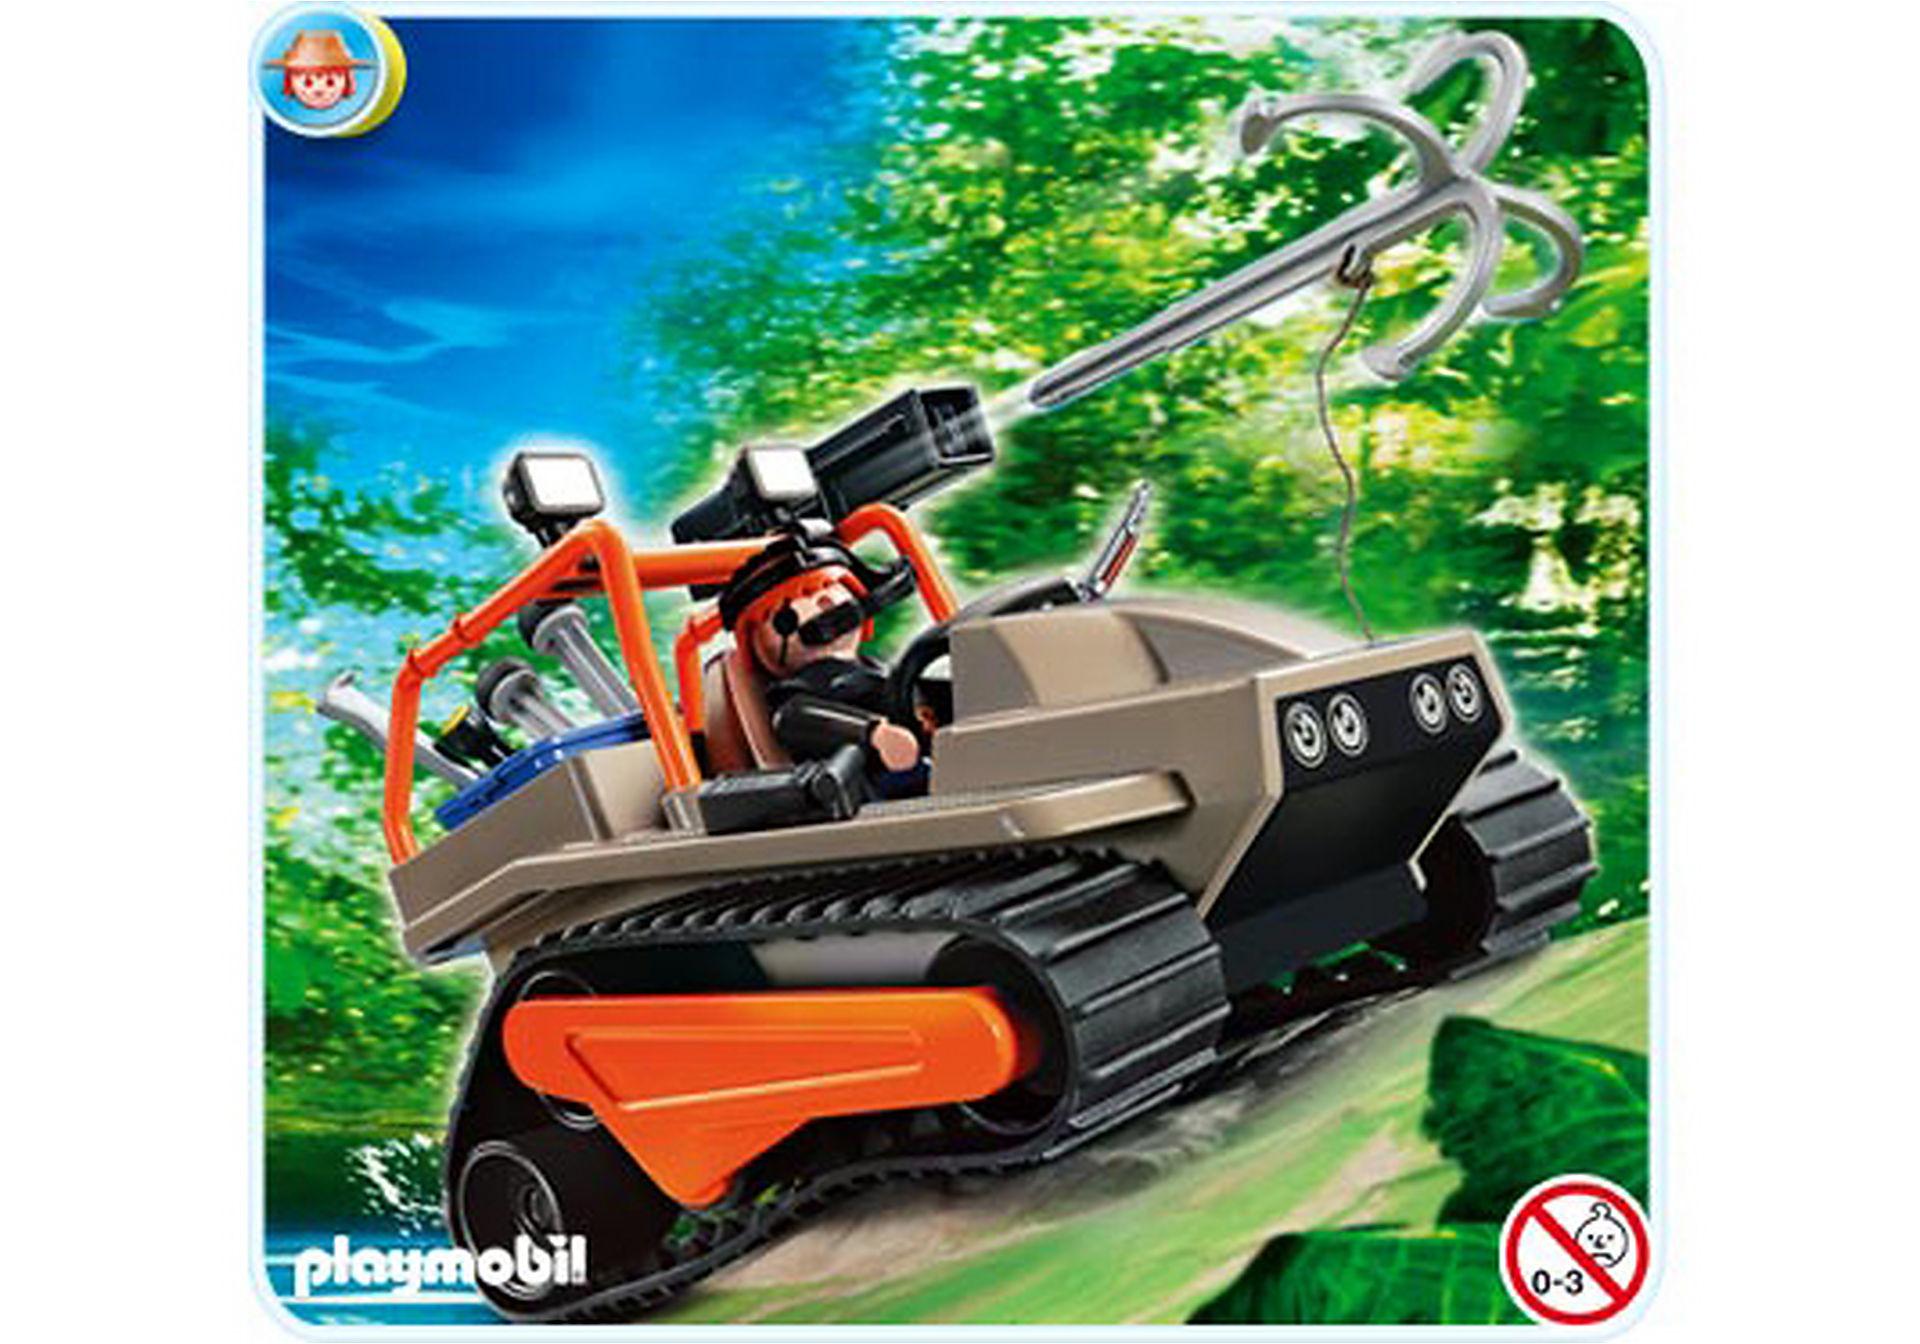 http://media.playmobil.com/i/playmobil/4846-A_product_detail/Véhicule à chenille et brigand